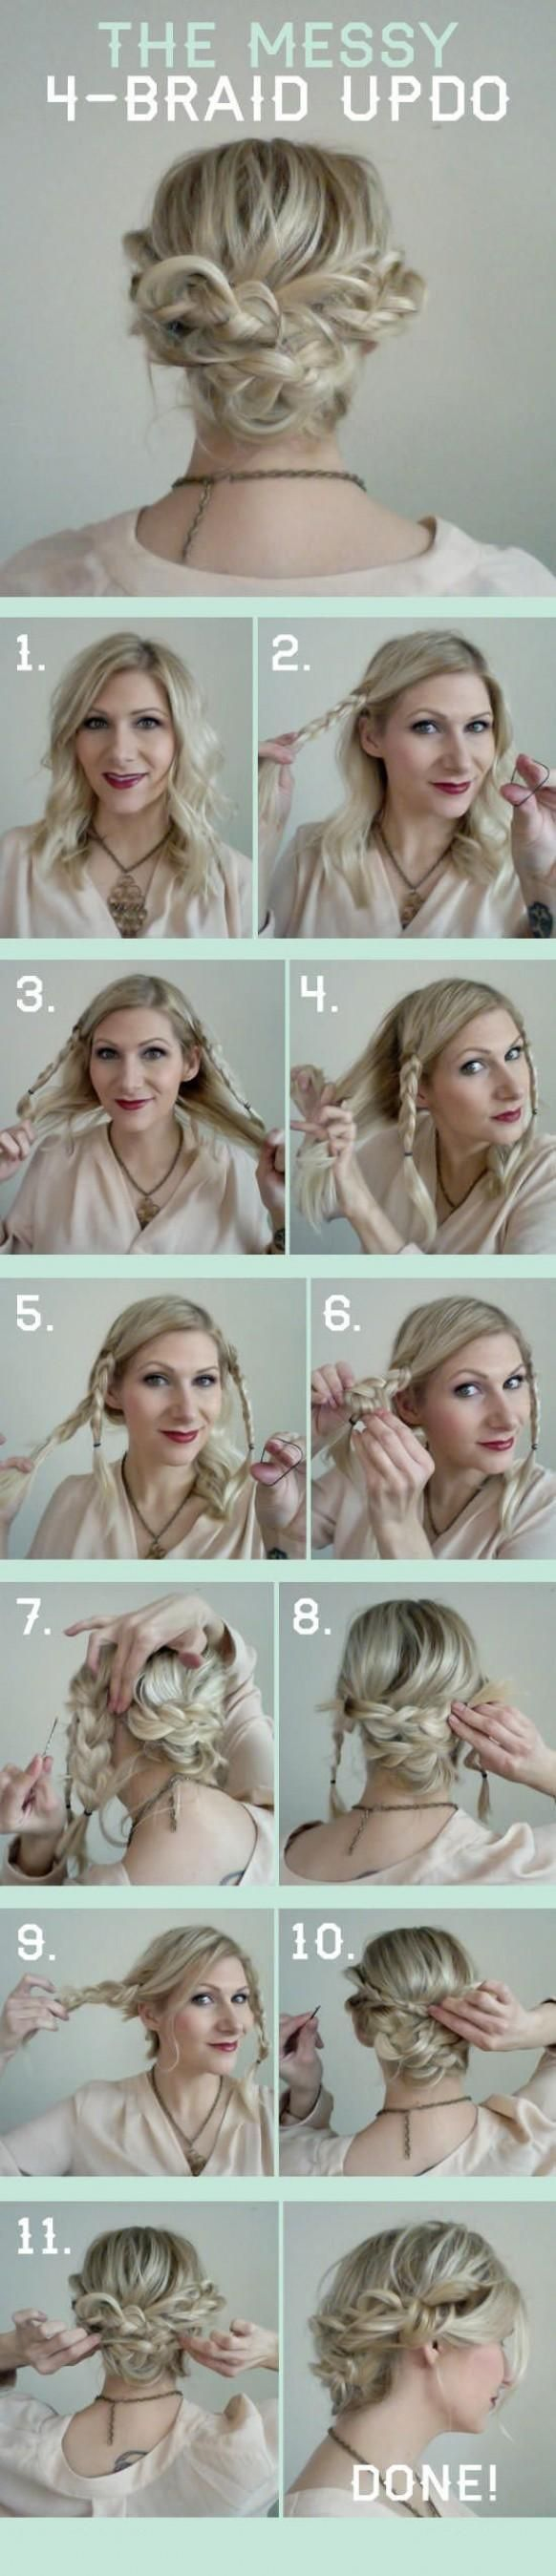 Cute Hairstyles For Medium Length Hair Classy 15 Cute And Easy Hairstyle Tutorials For Mediumlength Hair  Easy